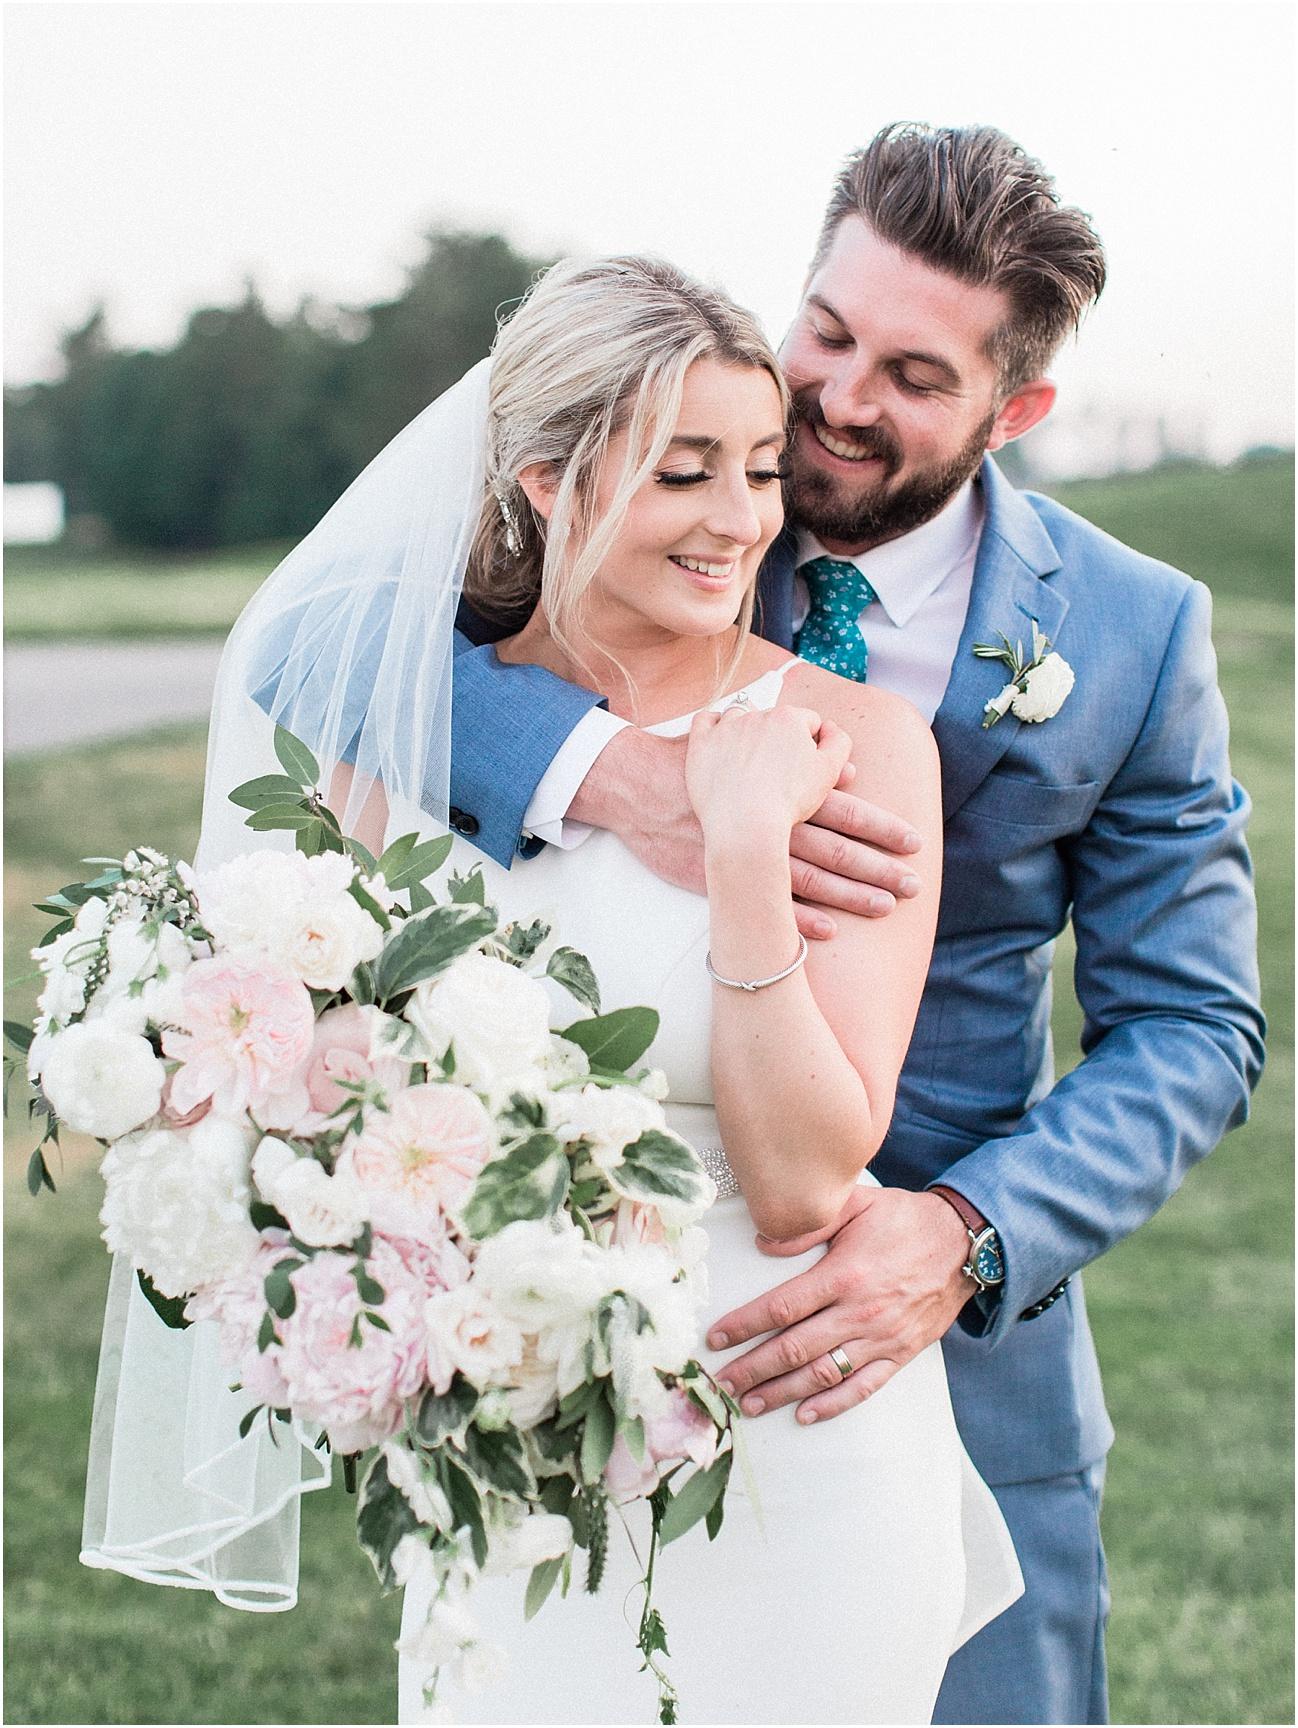 lindsey_paul_indian_pond_country_club_wild_dahlia_brewster_gardens_plymouth_cape_cod_boston_wedding_photographer_meredith_jane_photography_photo_0406.jpg